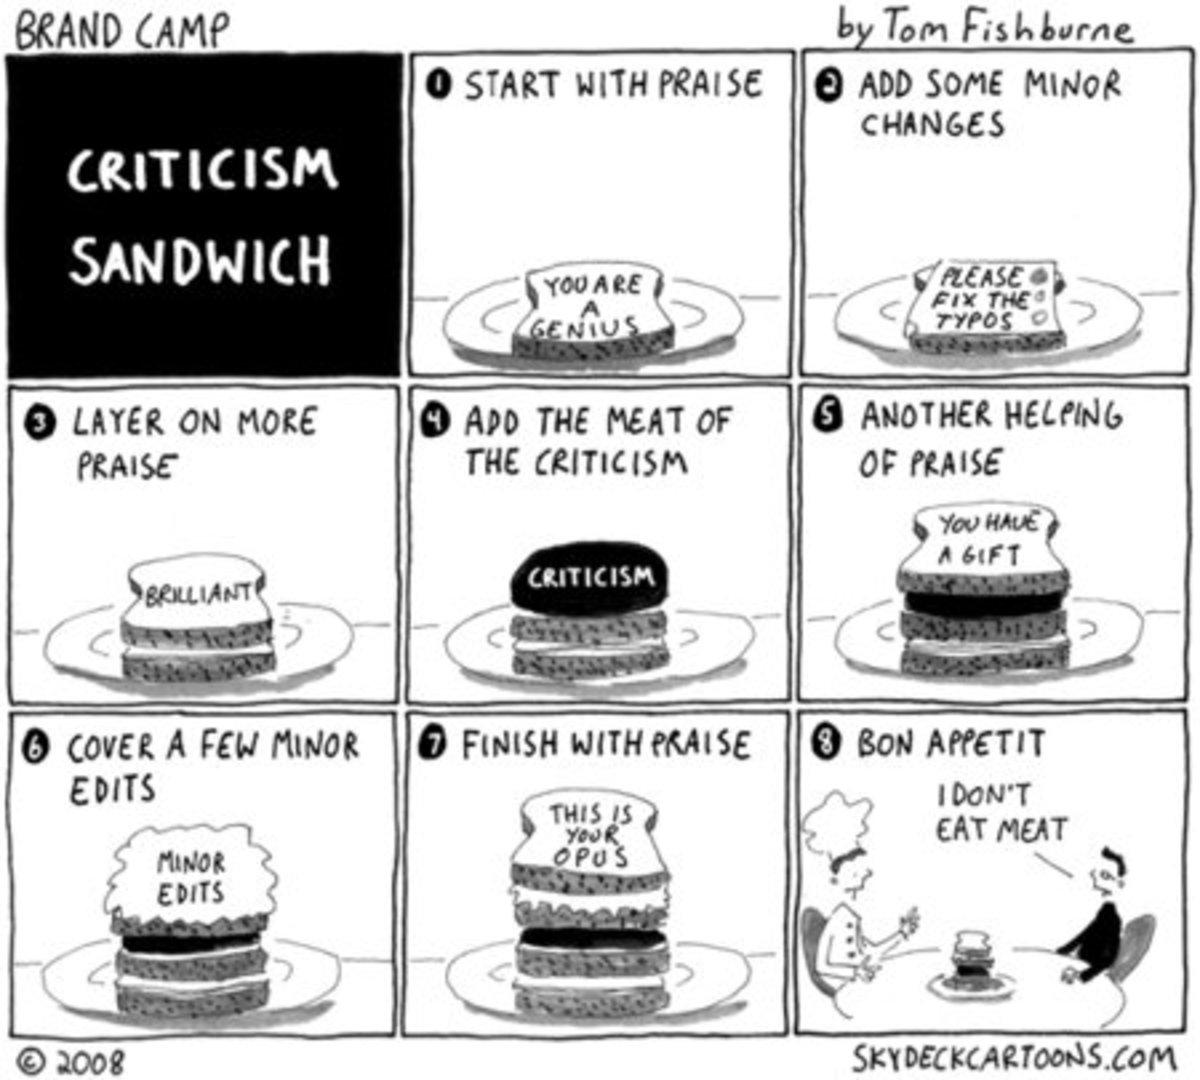 Feedback Sandwich © Tom Fishburne